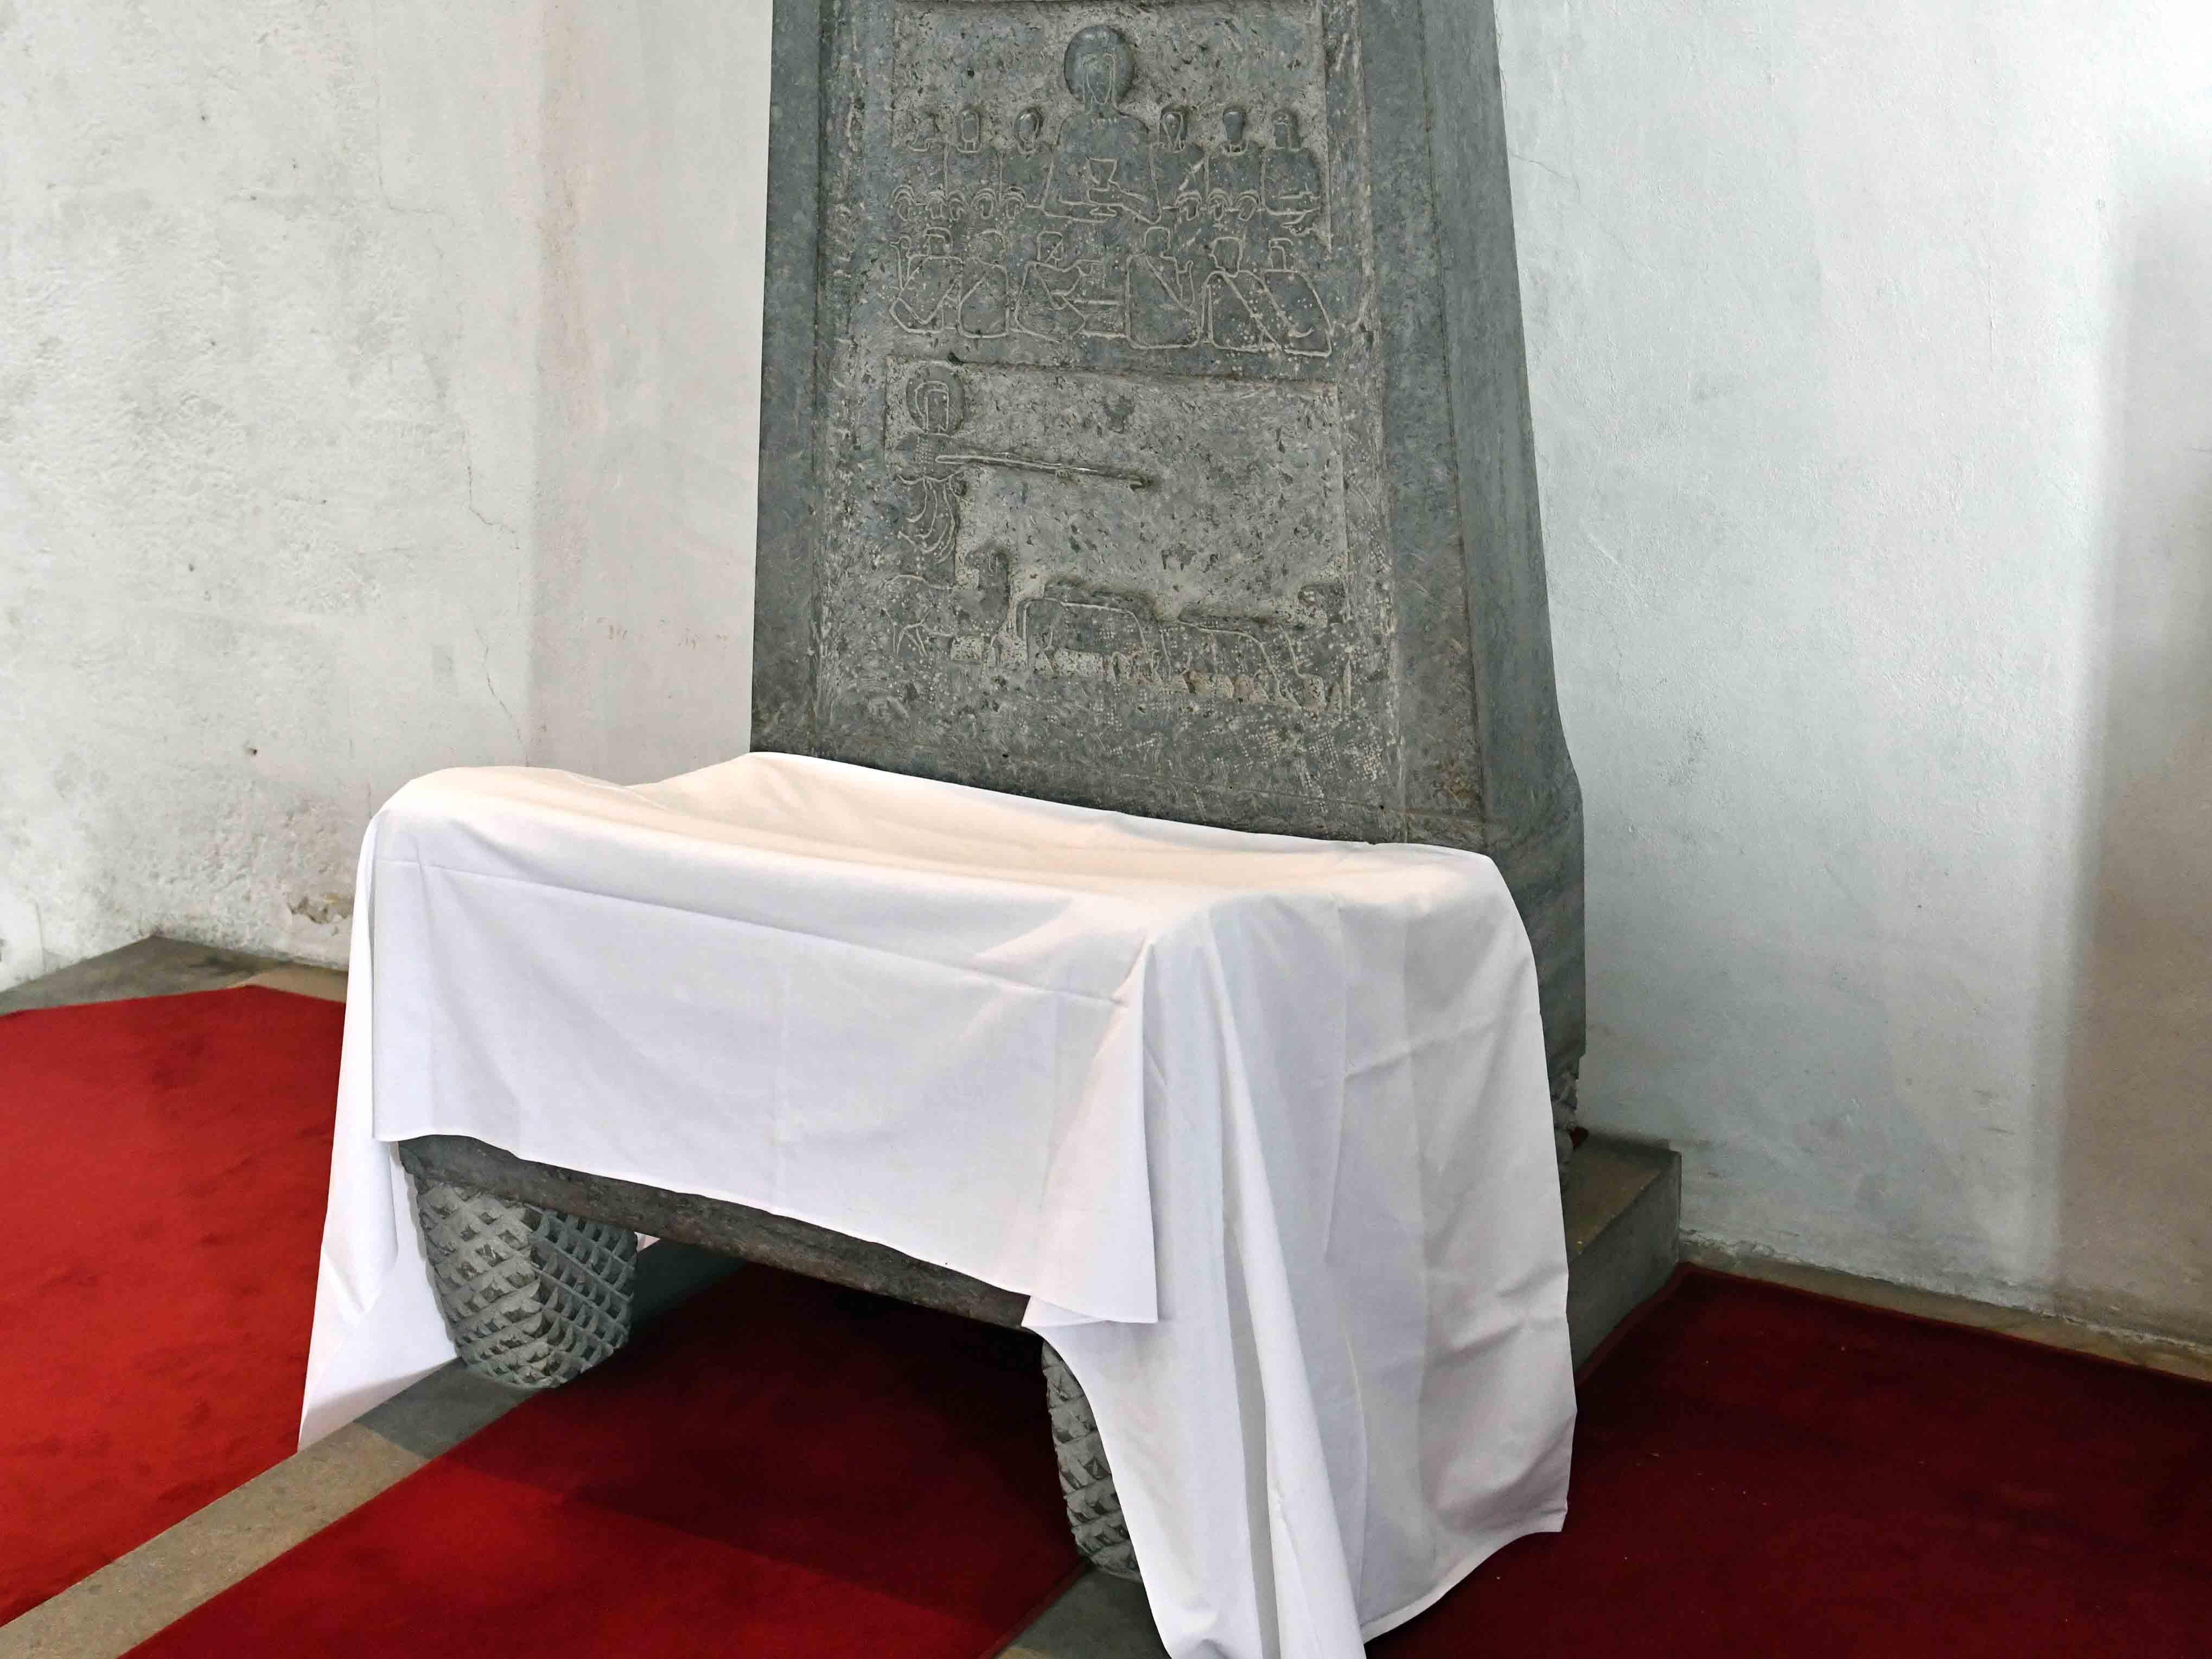 Verhüllte Kathedra im Augsburger Dom. (Foto: Nicolas Schnall / pba.)